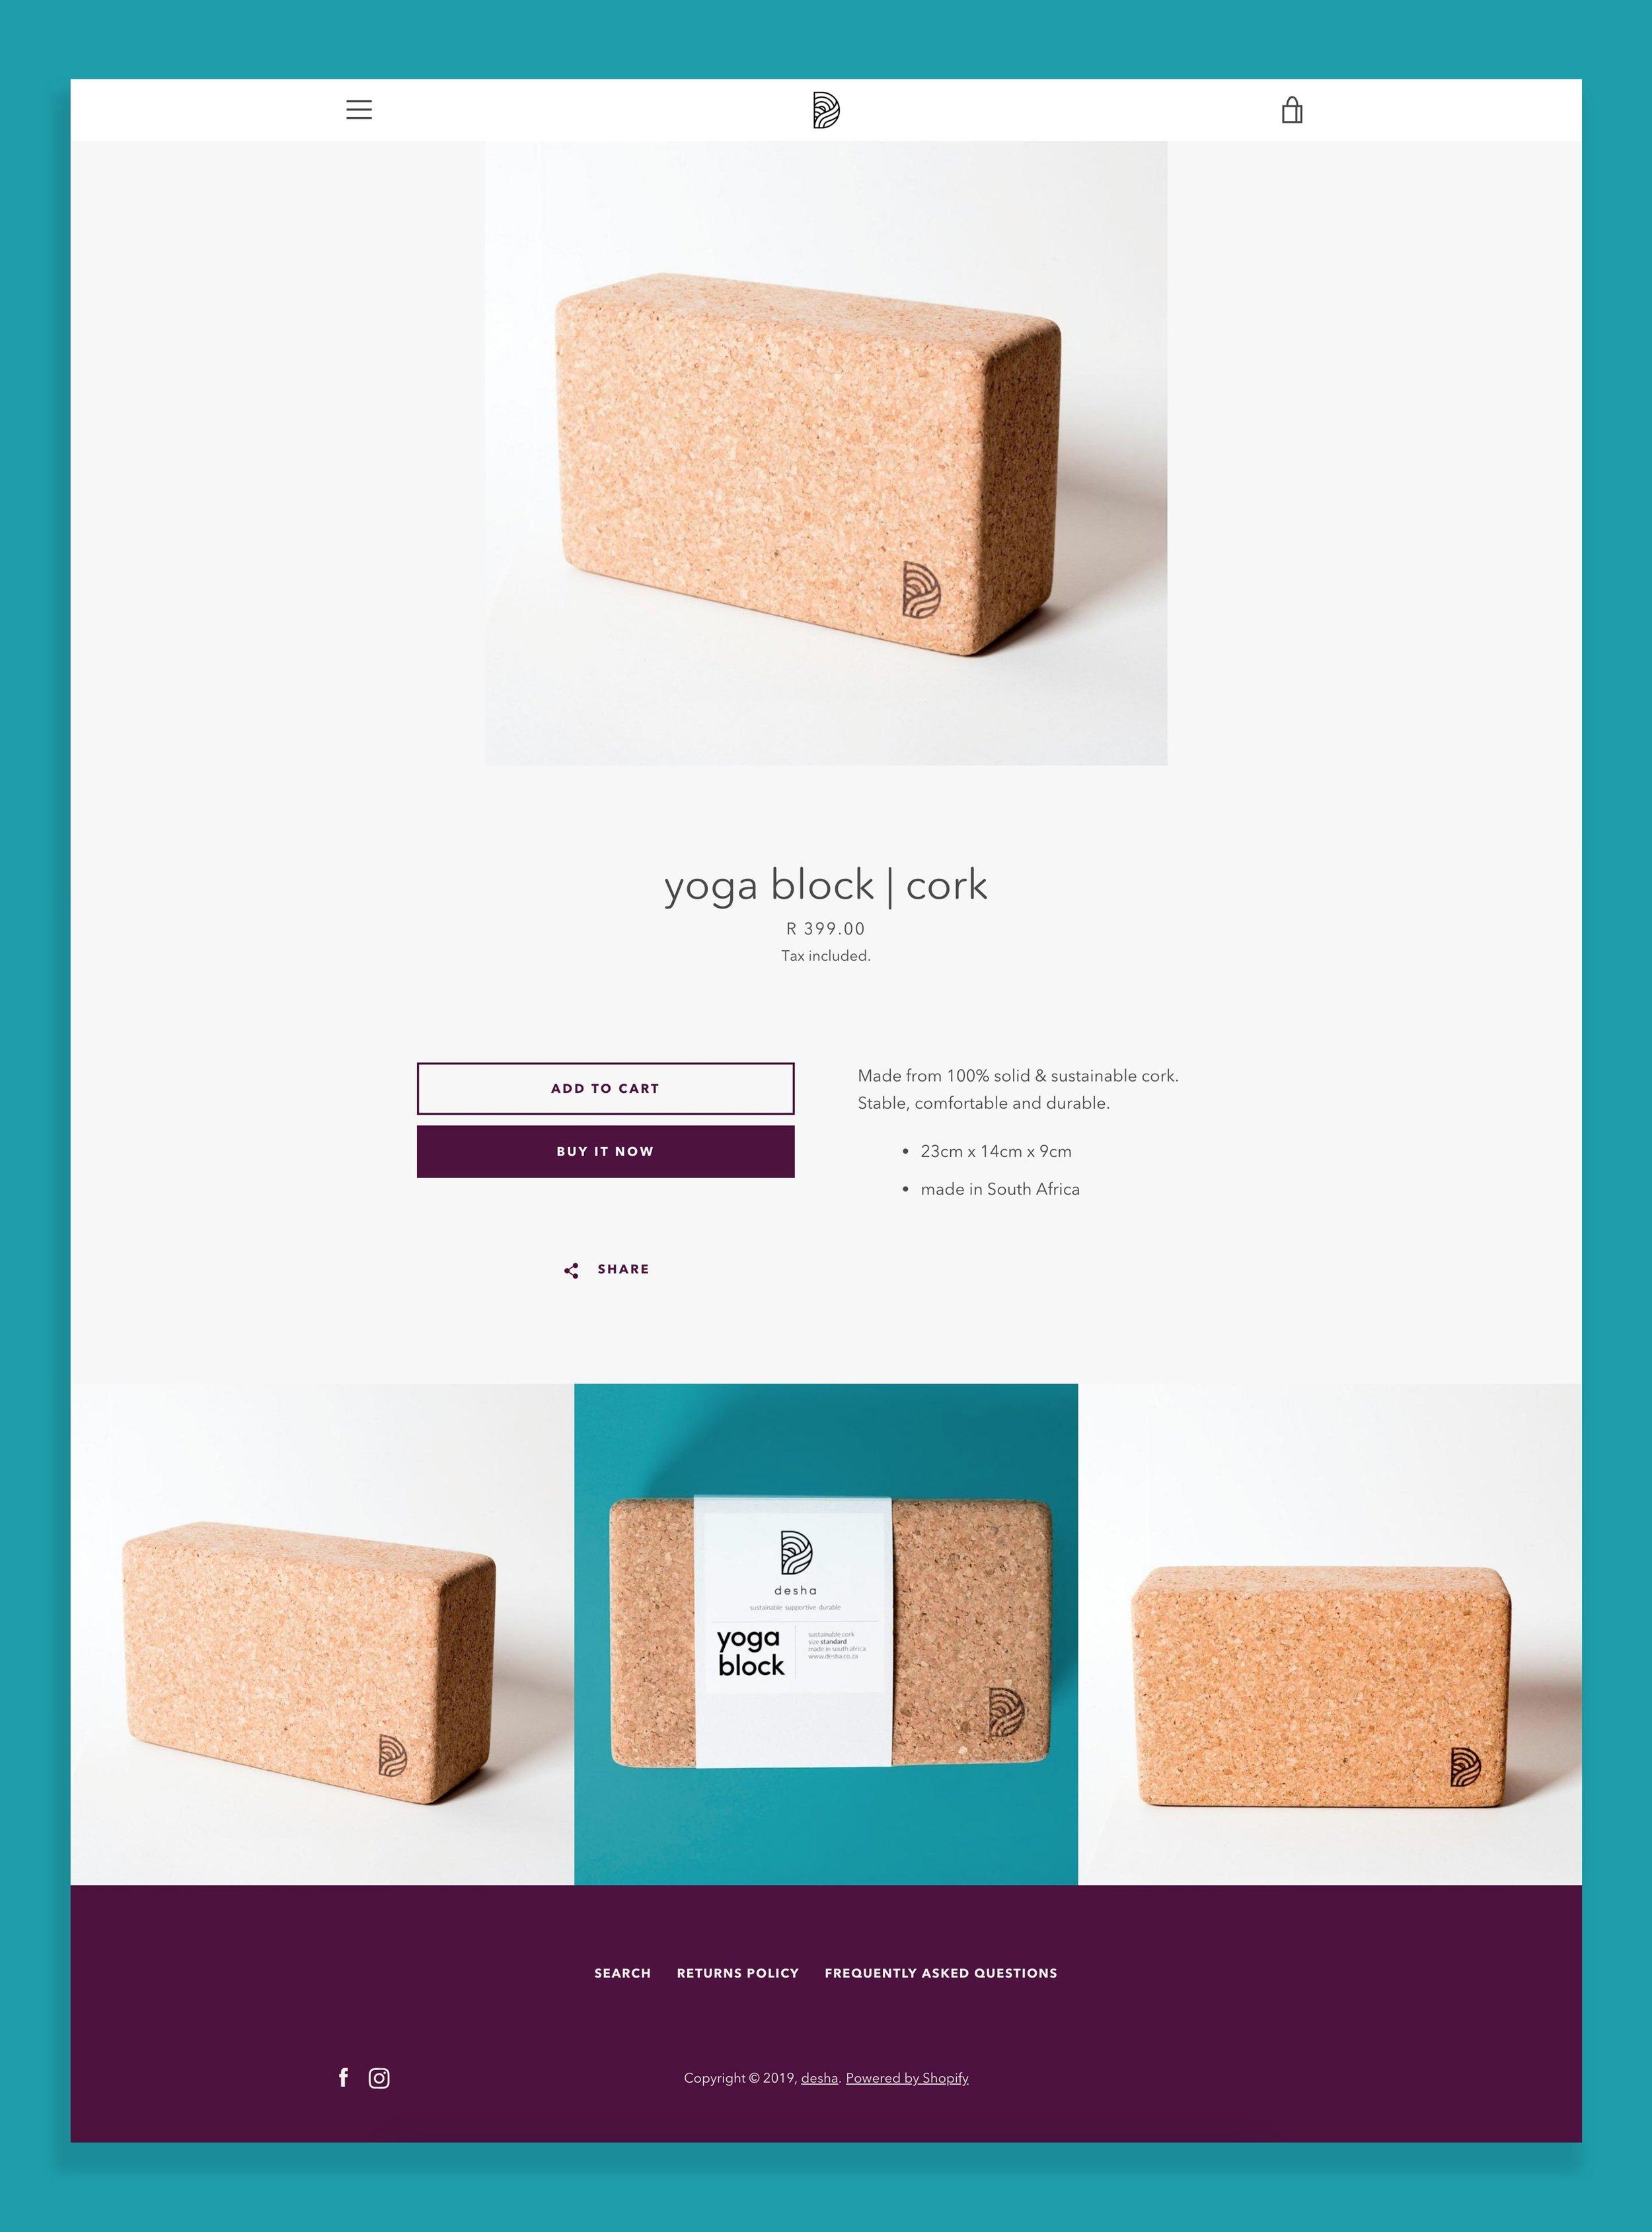 BorisHenry-Design-Brand-Agency-Cape-Town-Desha-2.jpg